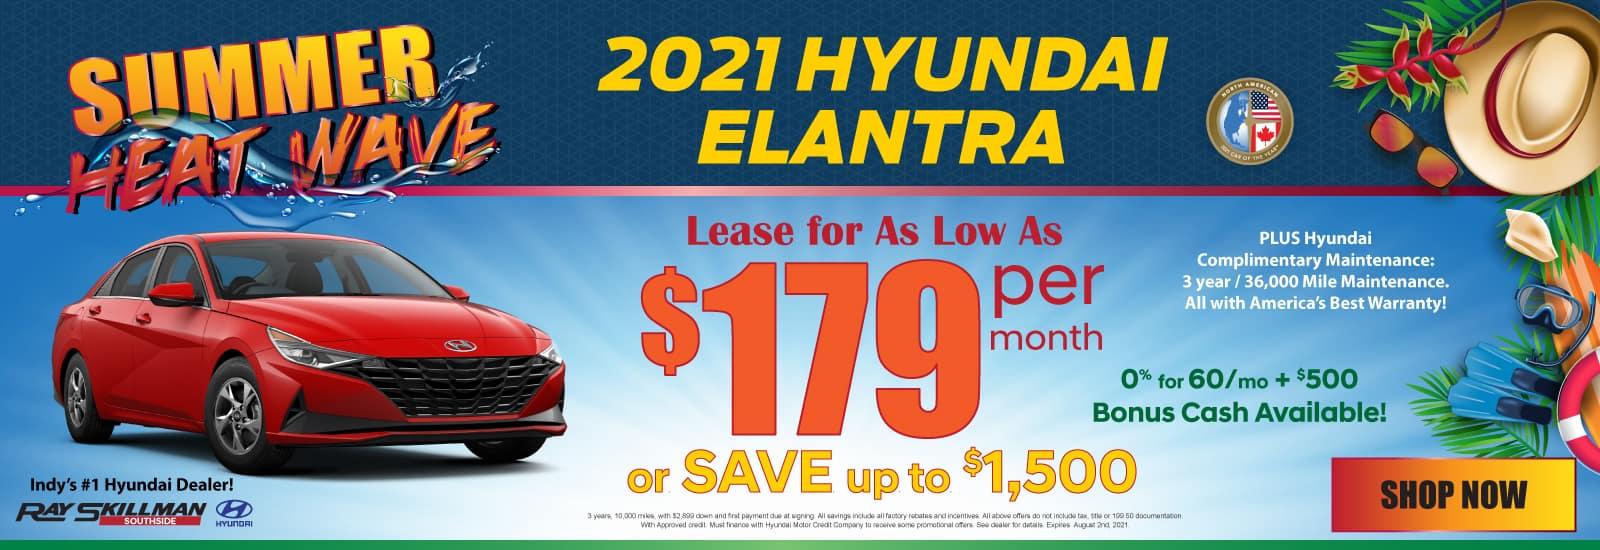 2021-Hyundai-Elantra-Web-Banner-1600×550 (004)July